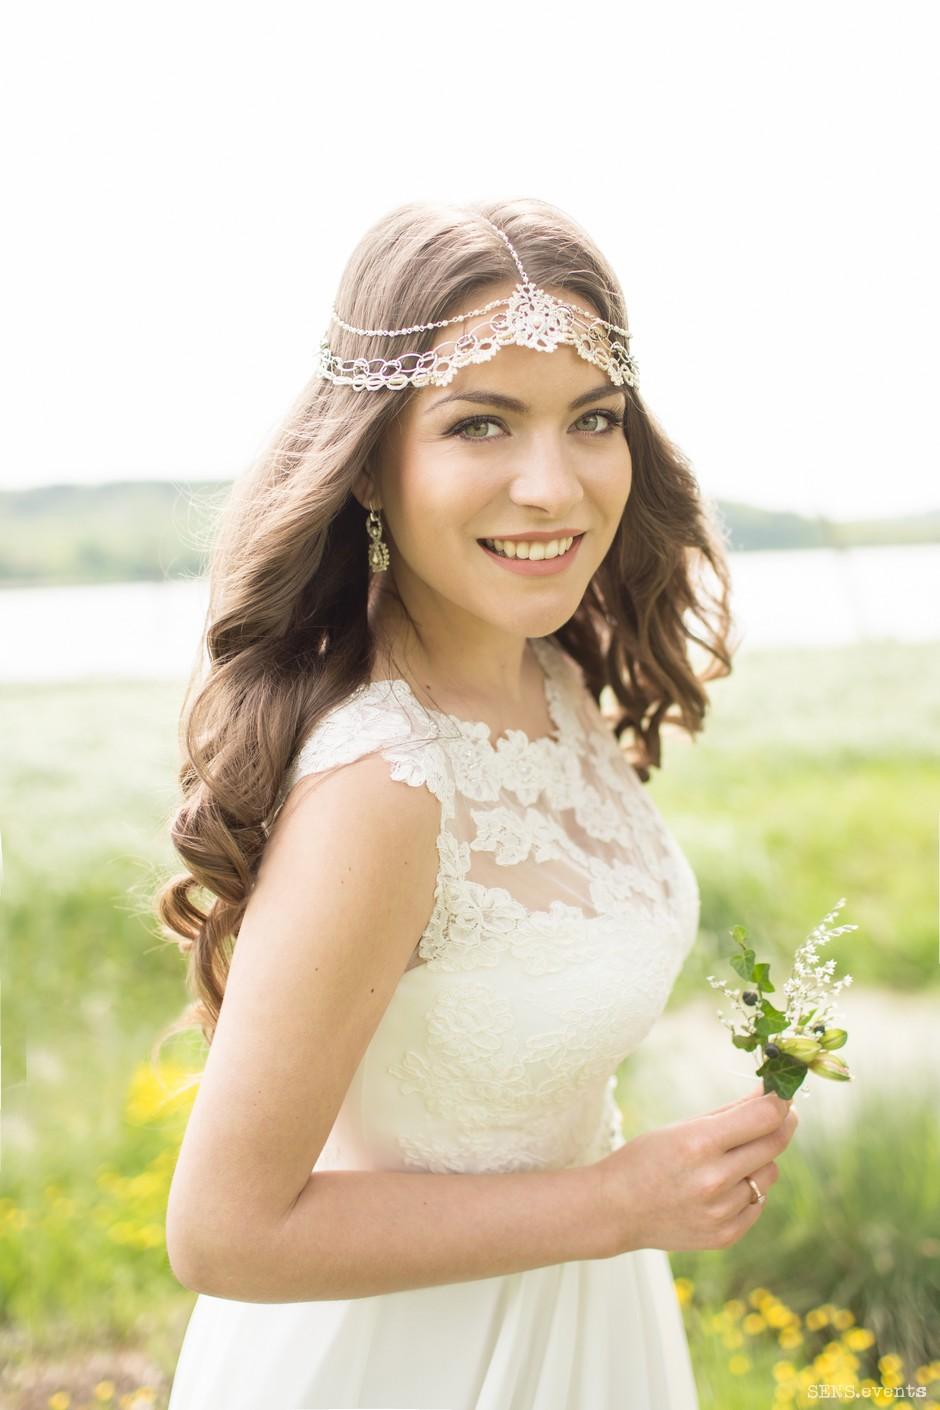 Sens_events_couple_2_Ionela_Sergiu-003